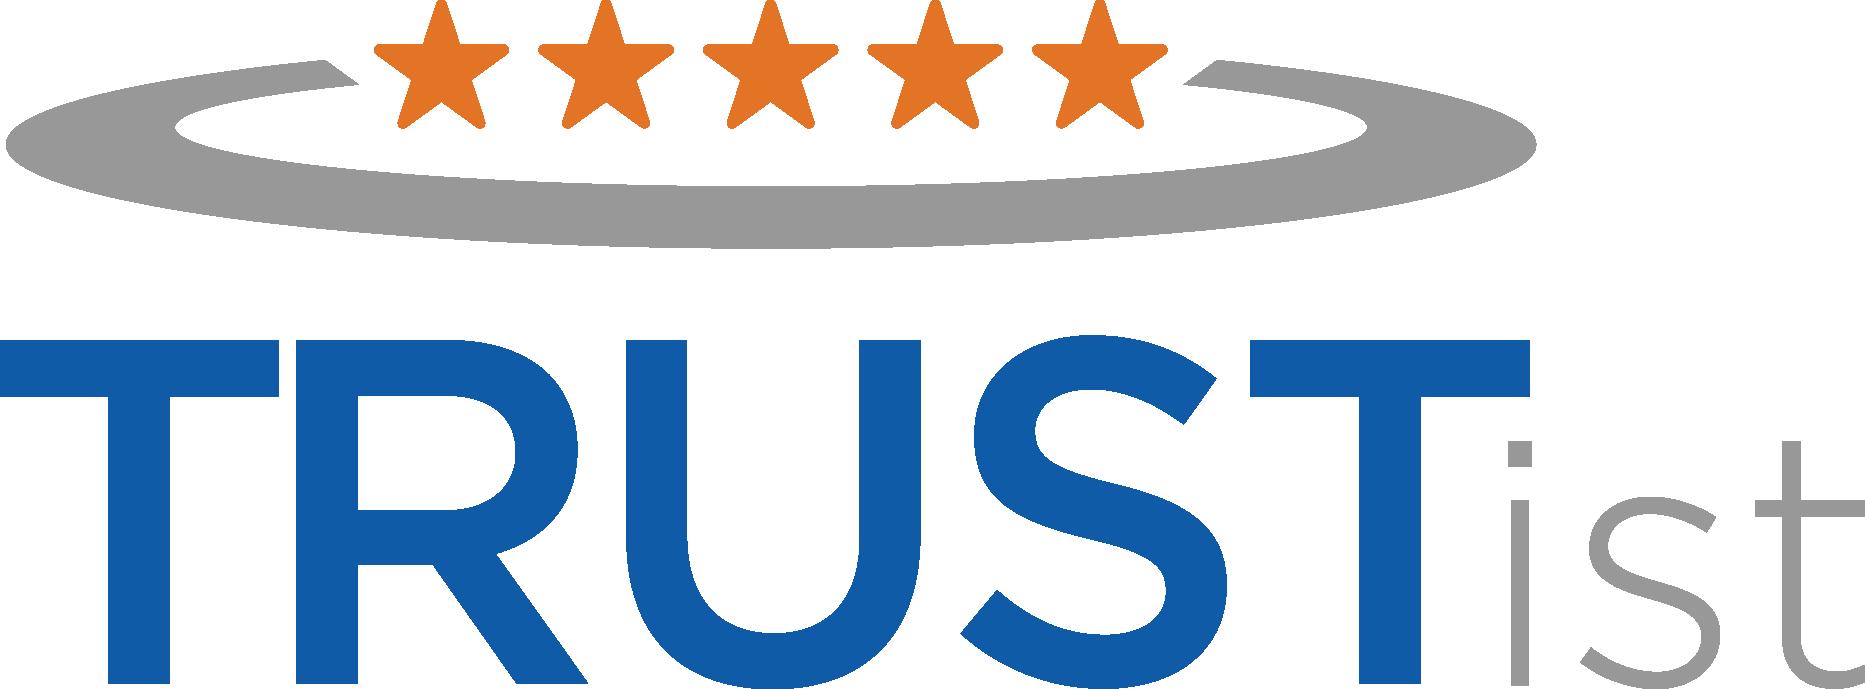 5-star-ciustomer-reviews-building-services-battersea